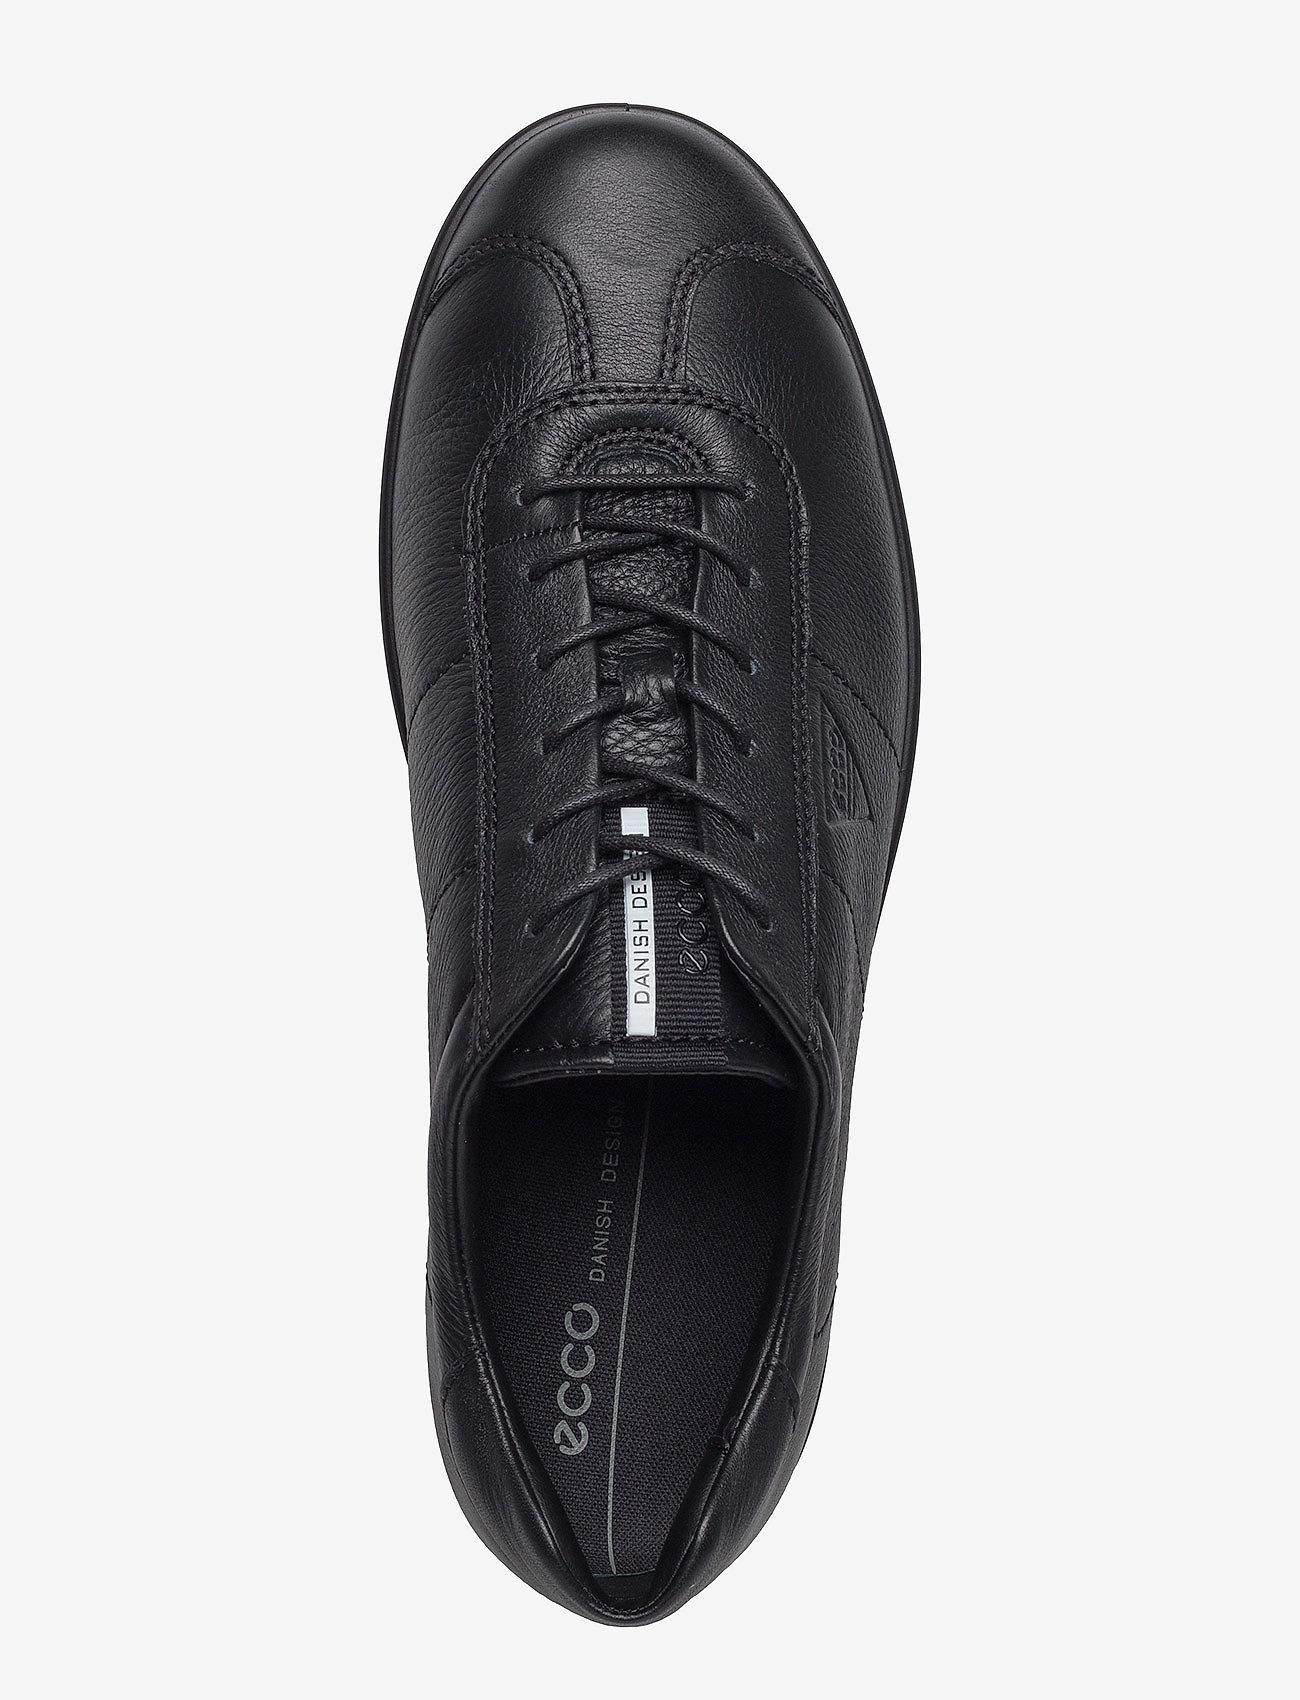 Ecco Soft 1 Mens - Sneakers Black